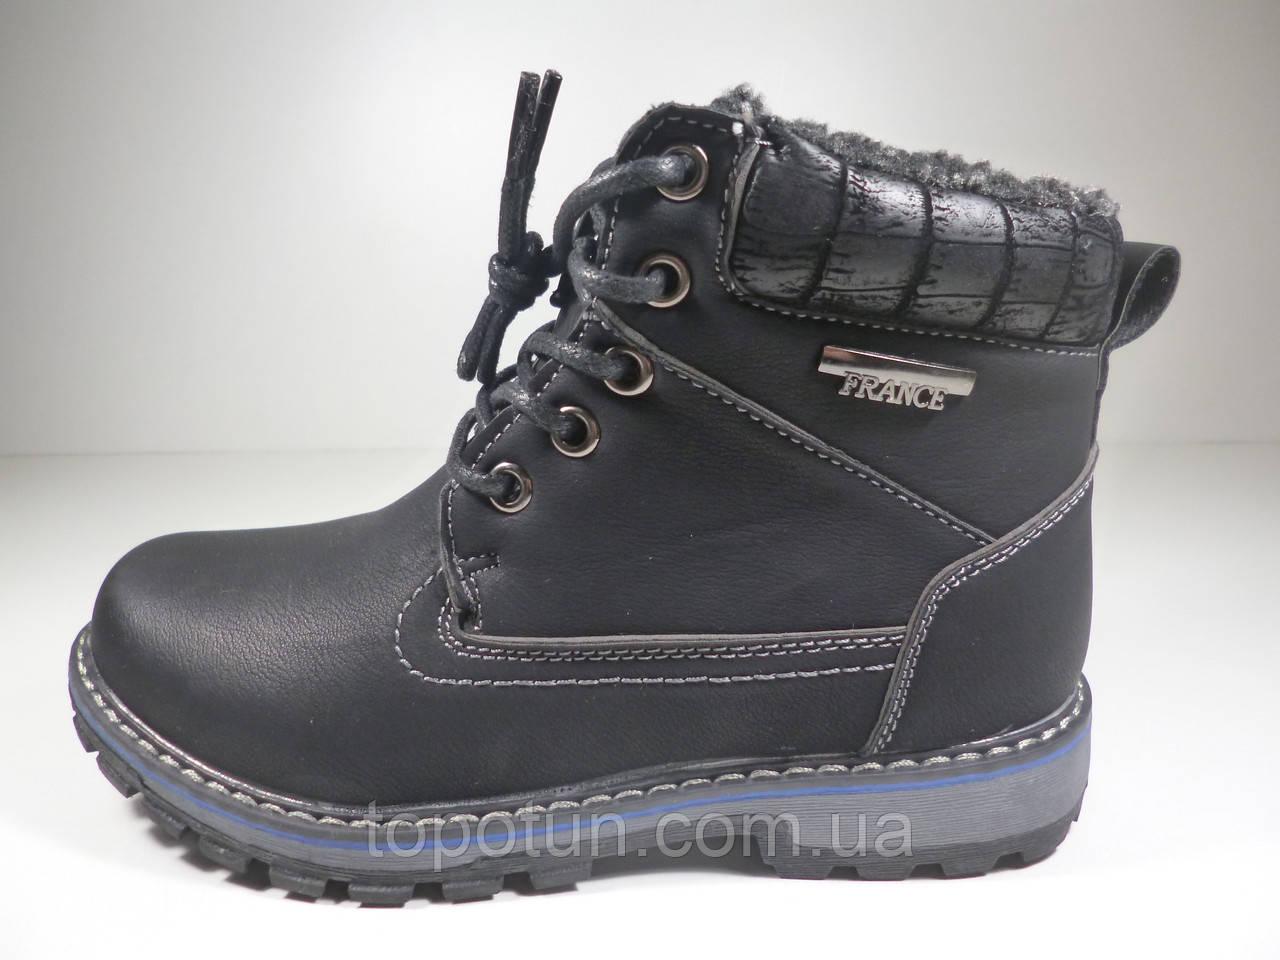 a08e97917 Ботинки для Мальчиков Jong Golf Размер: 32,33,34,35,36,37 — в ...